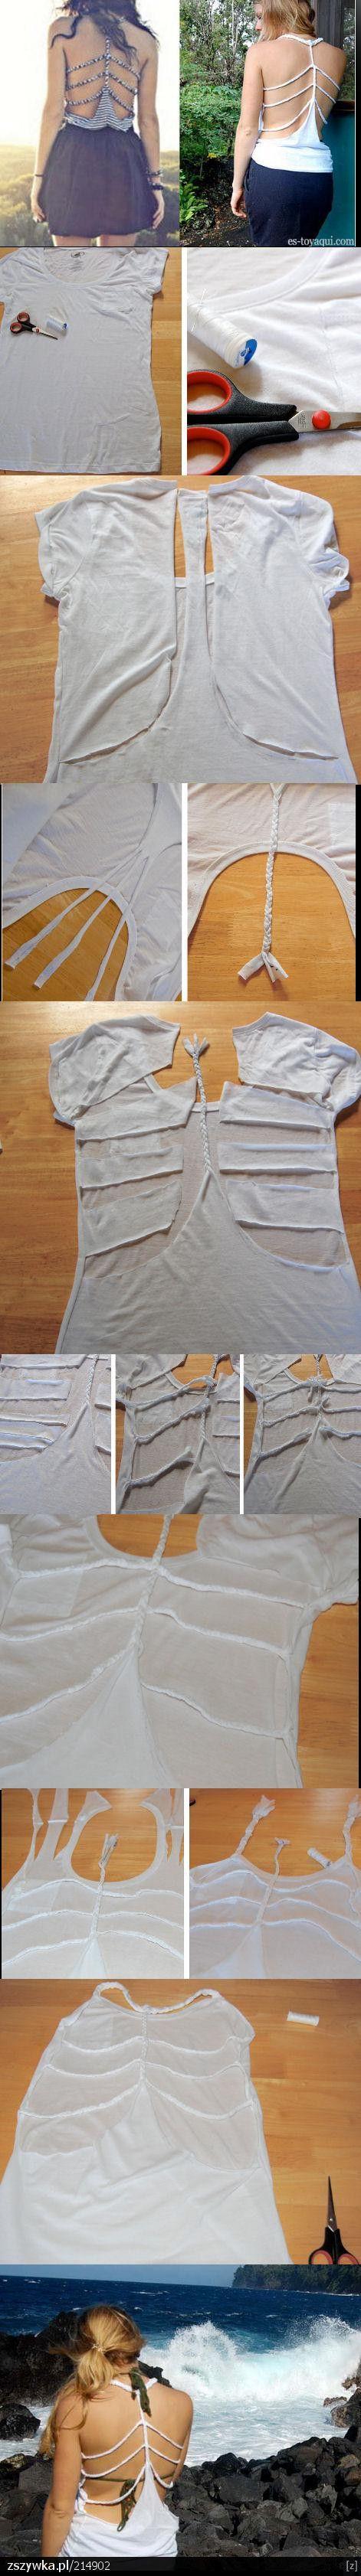 #diy #customisation #tee shirt